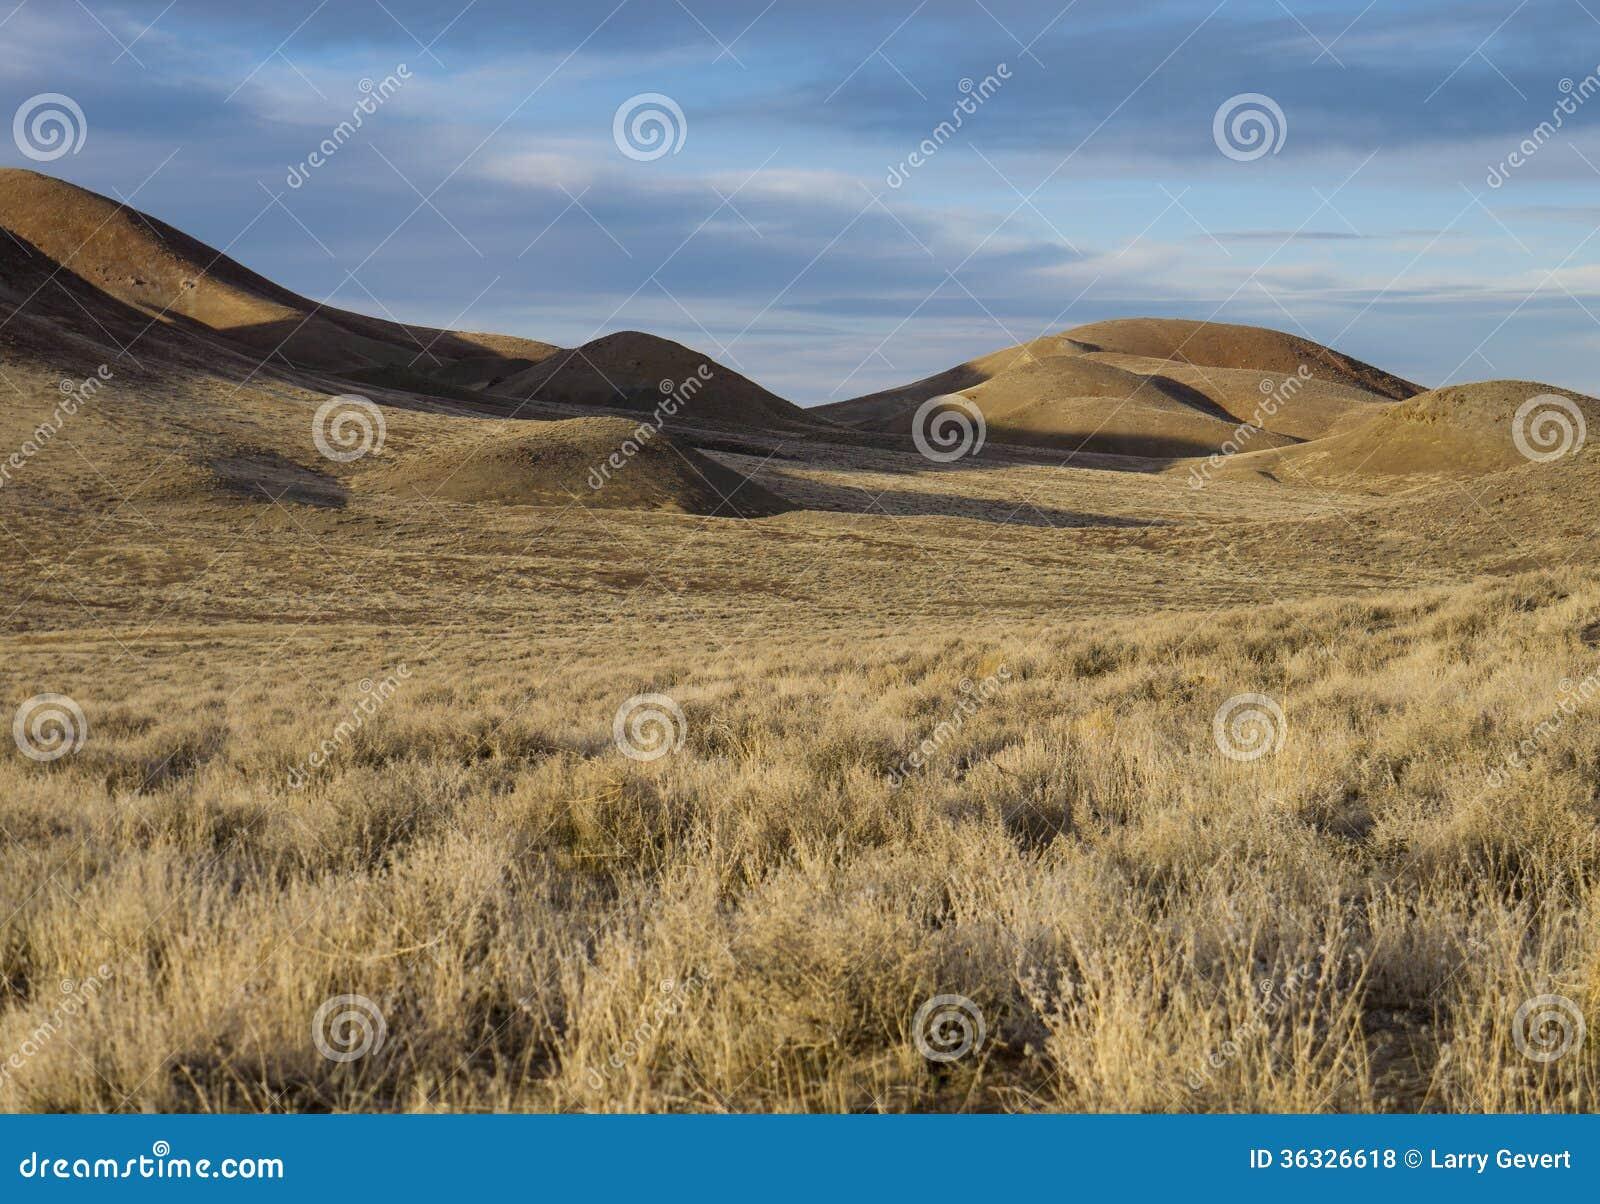 Desert Scenery Royalty Free Stock Photos Image 36326618